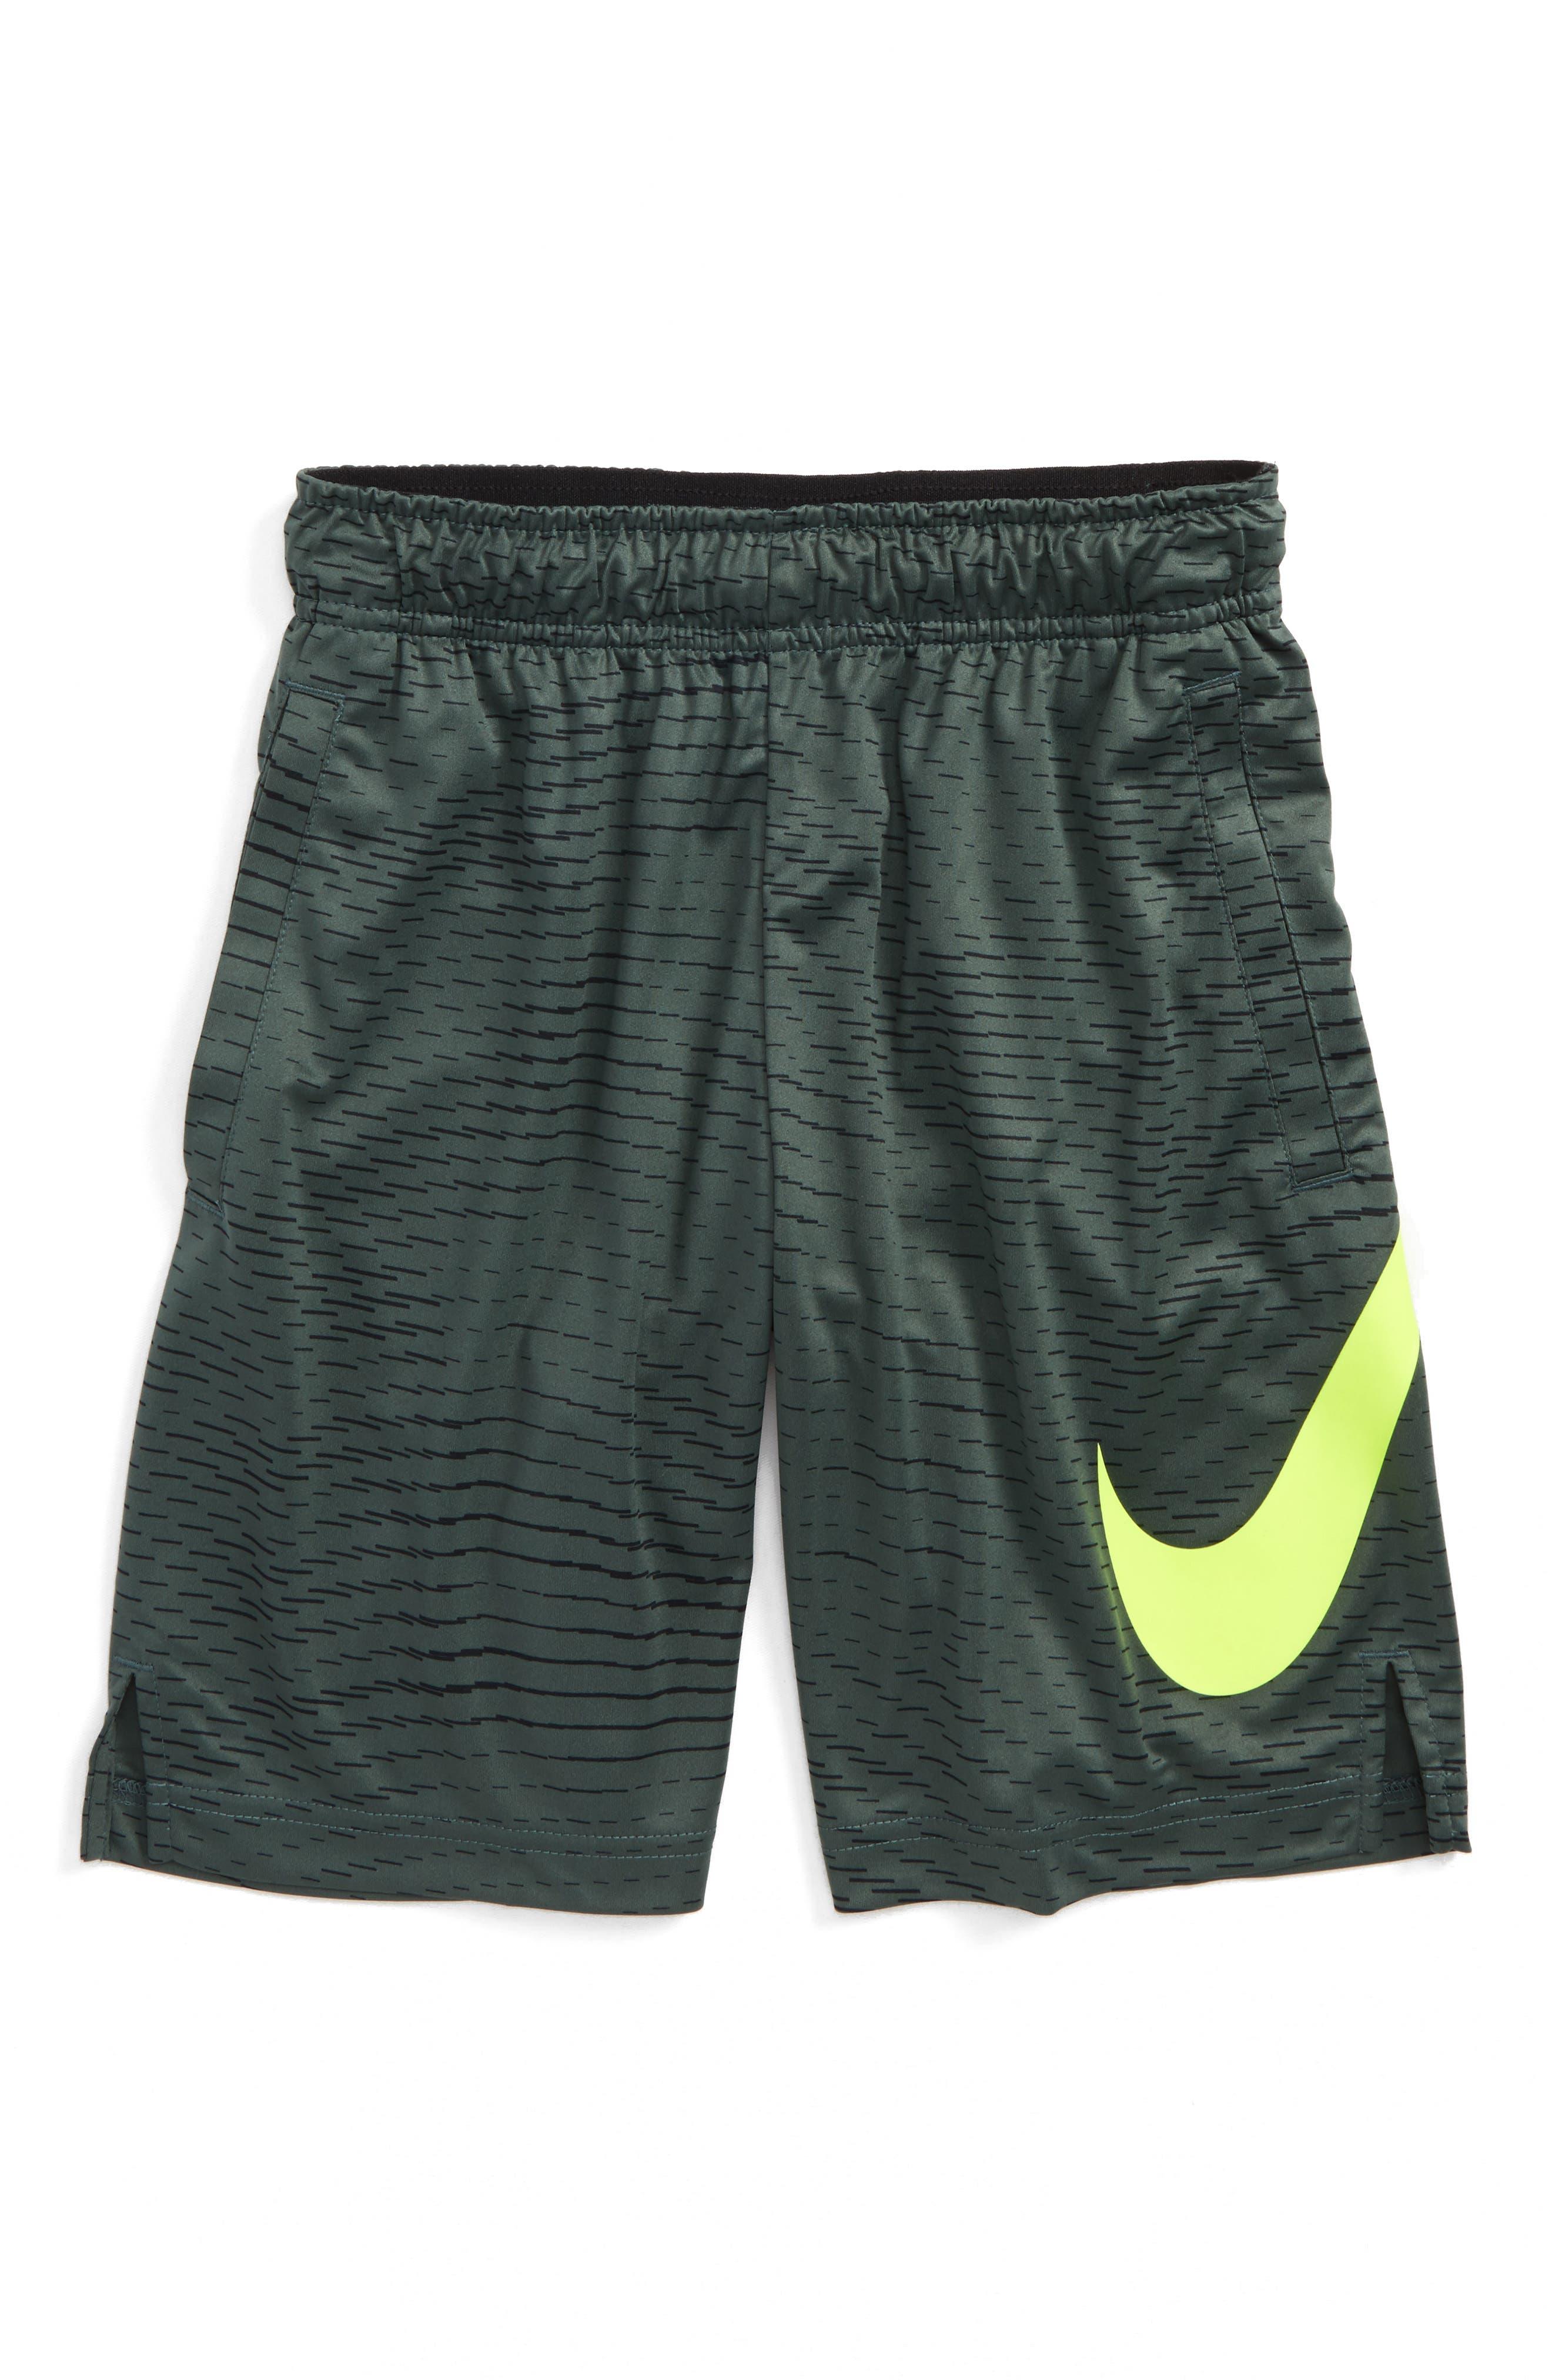 NIKE AOP Dry Shorts